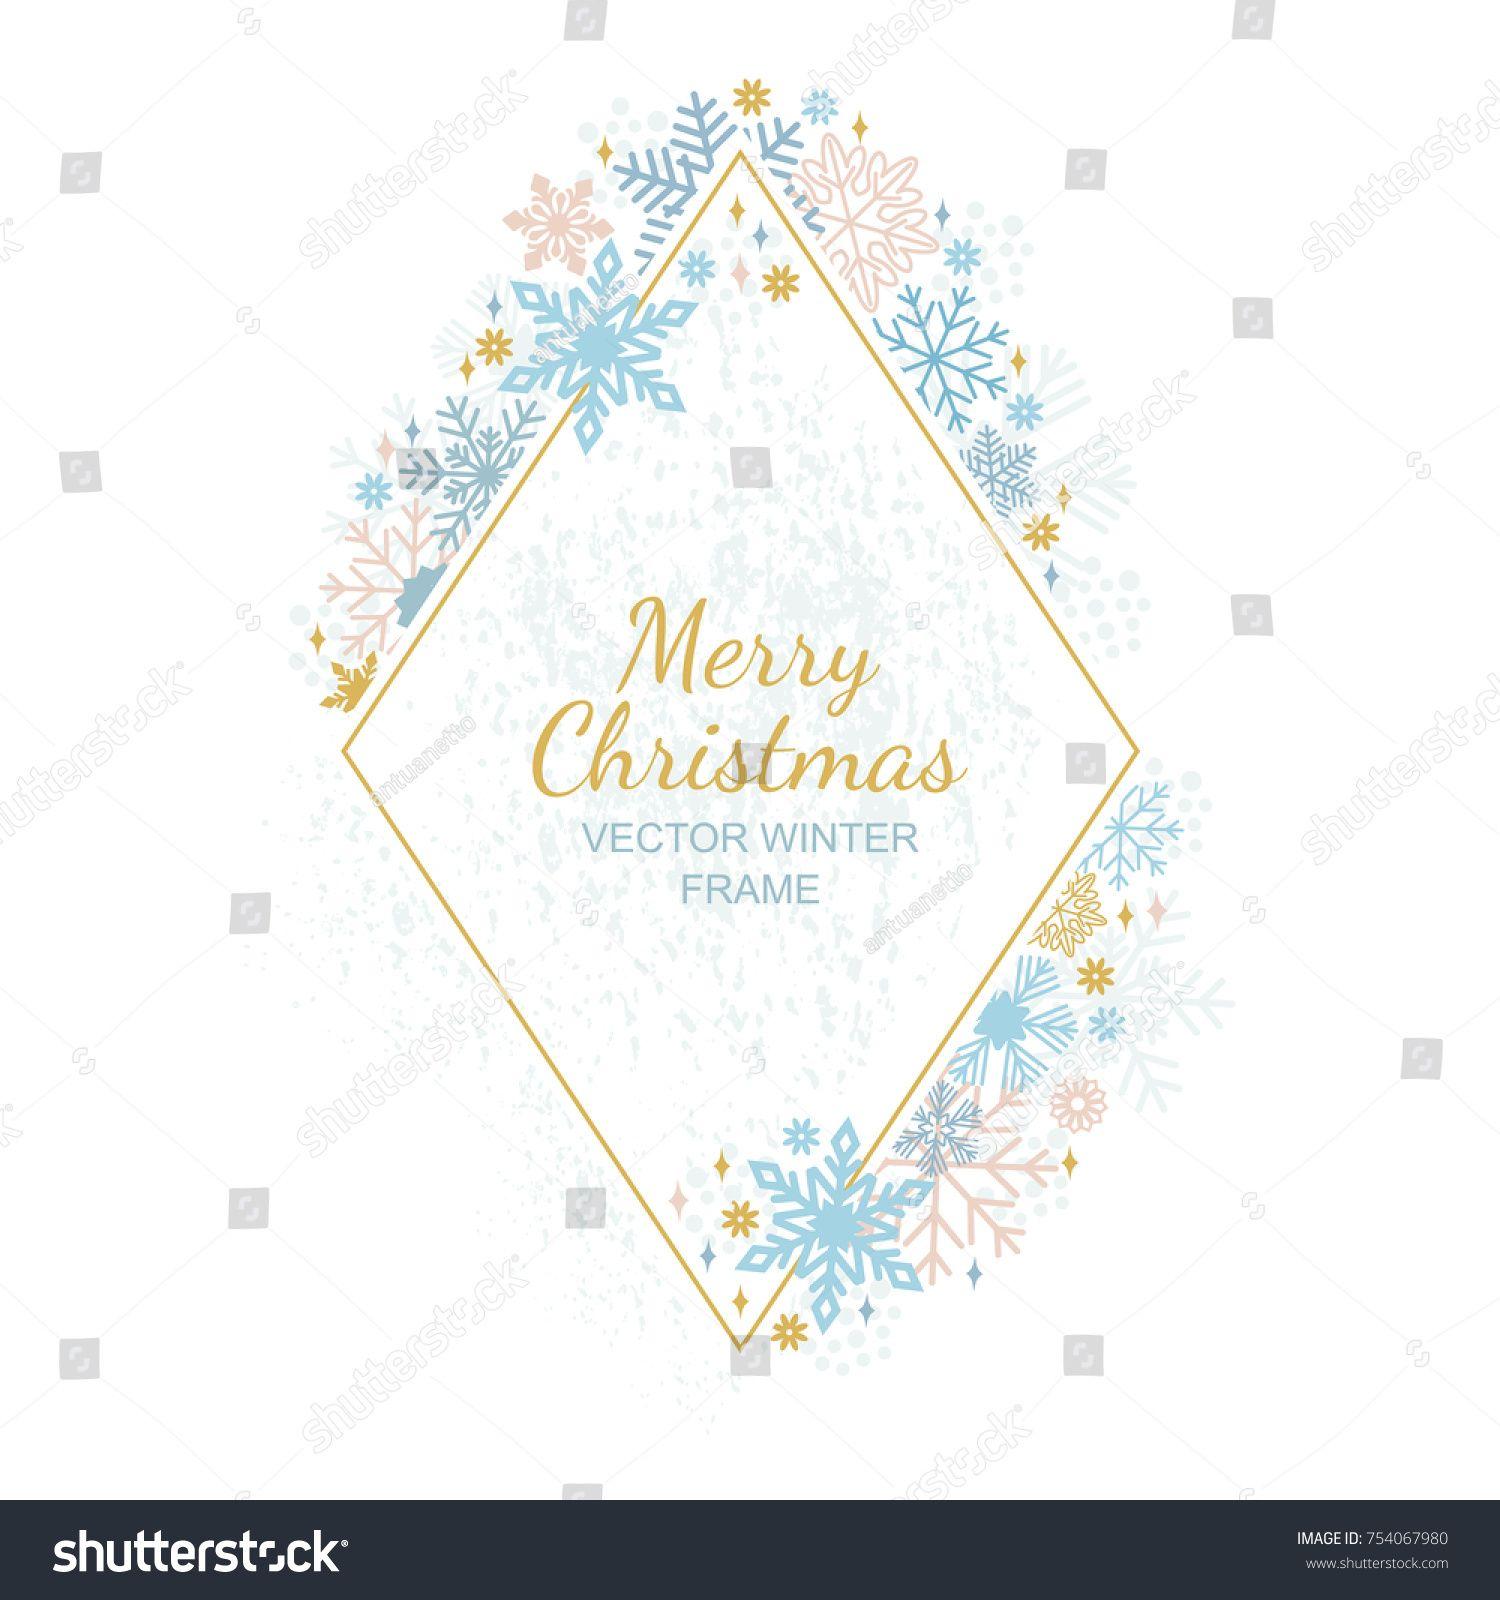 Snow flake frame decoration on white background christmas design snow flake frame decoration on white background christmas design for invitation greeting card vector illustration merry xmas snowflake framework 18 stopboris Images